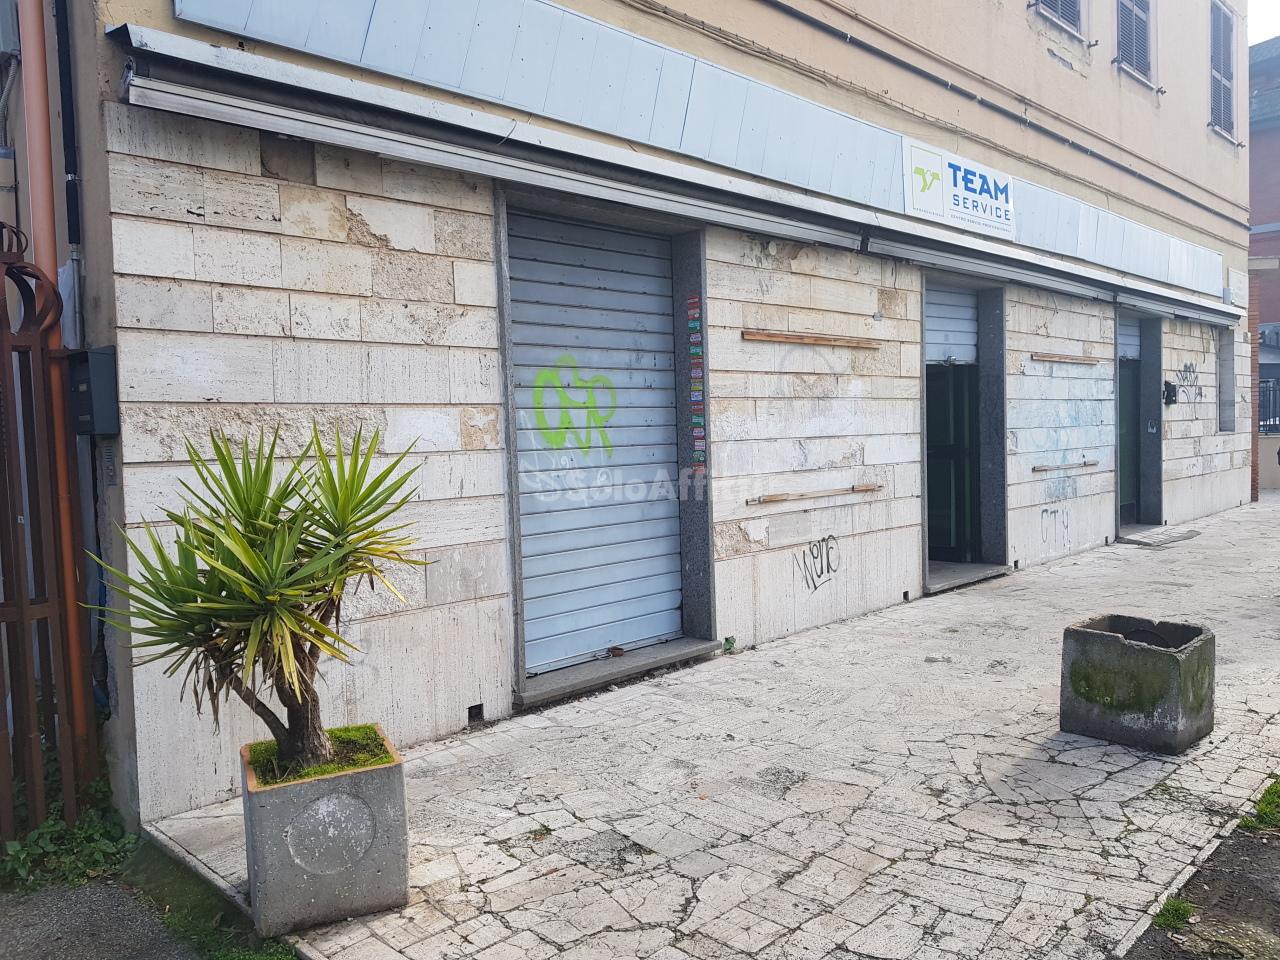 Fondo/negozio - 3 vetrine/luci a Tor Vergata-Romanina-Morena , Roma Rif. 11577388